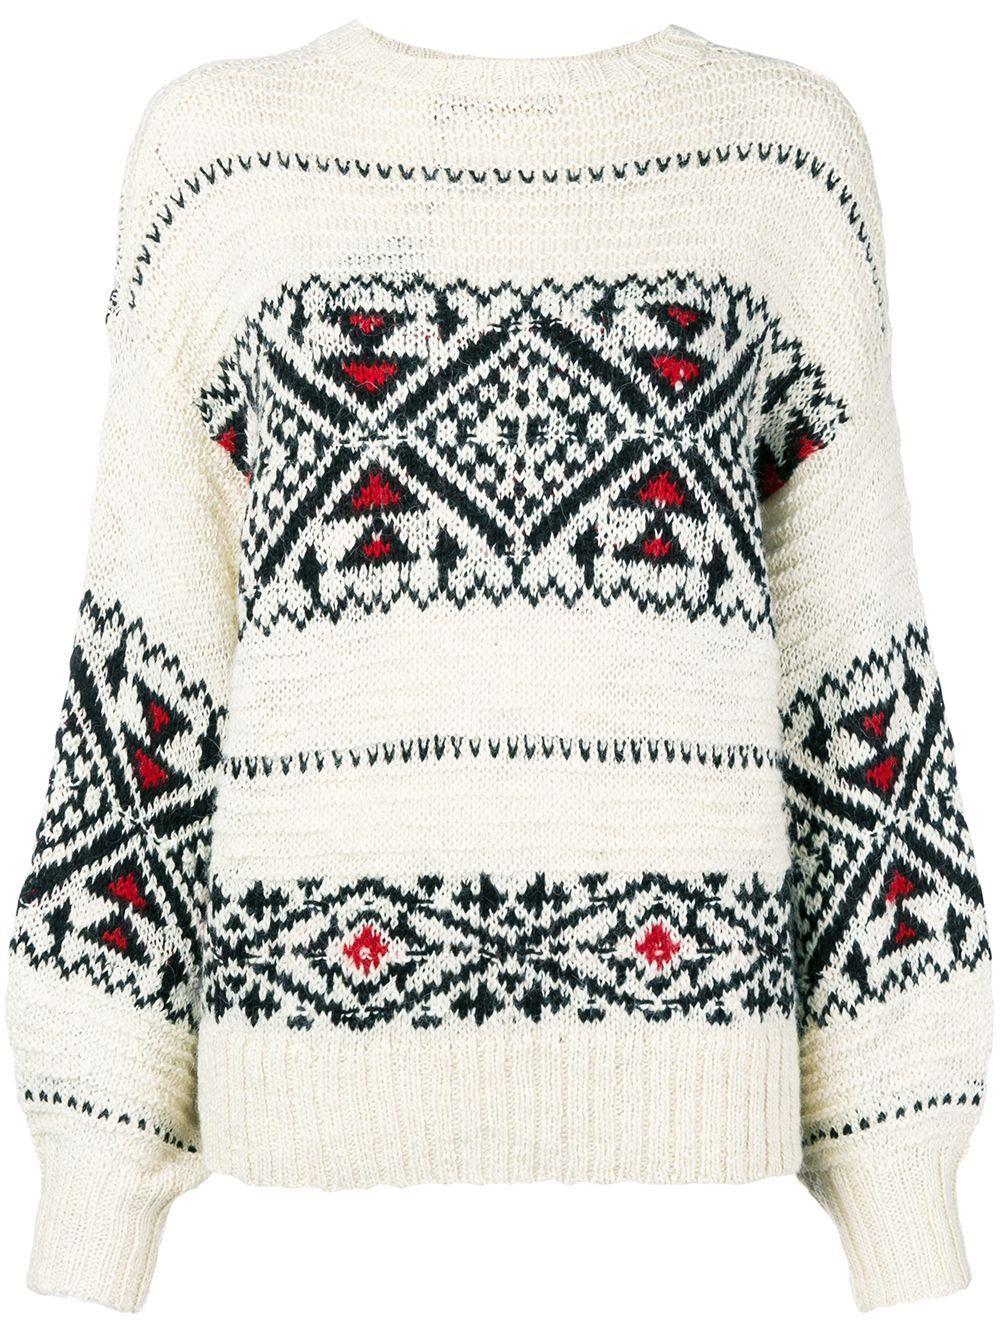 Polo Ralph Lauren chunky knit jumper - White